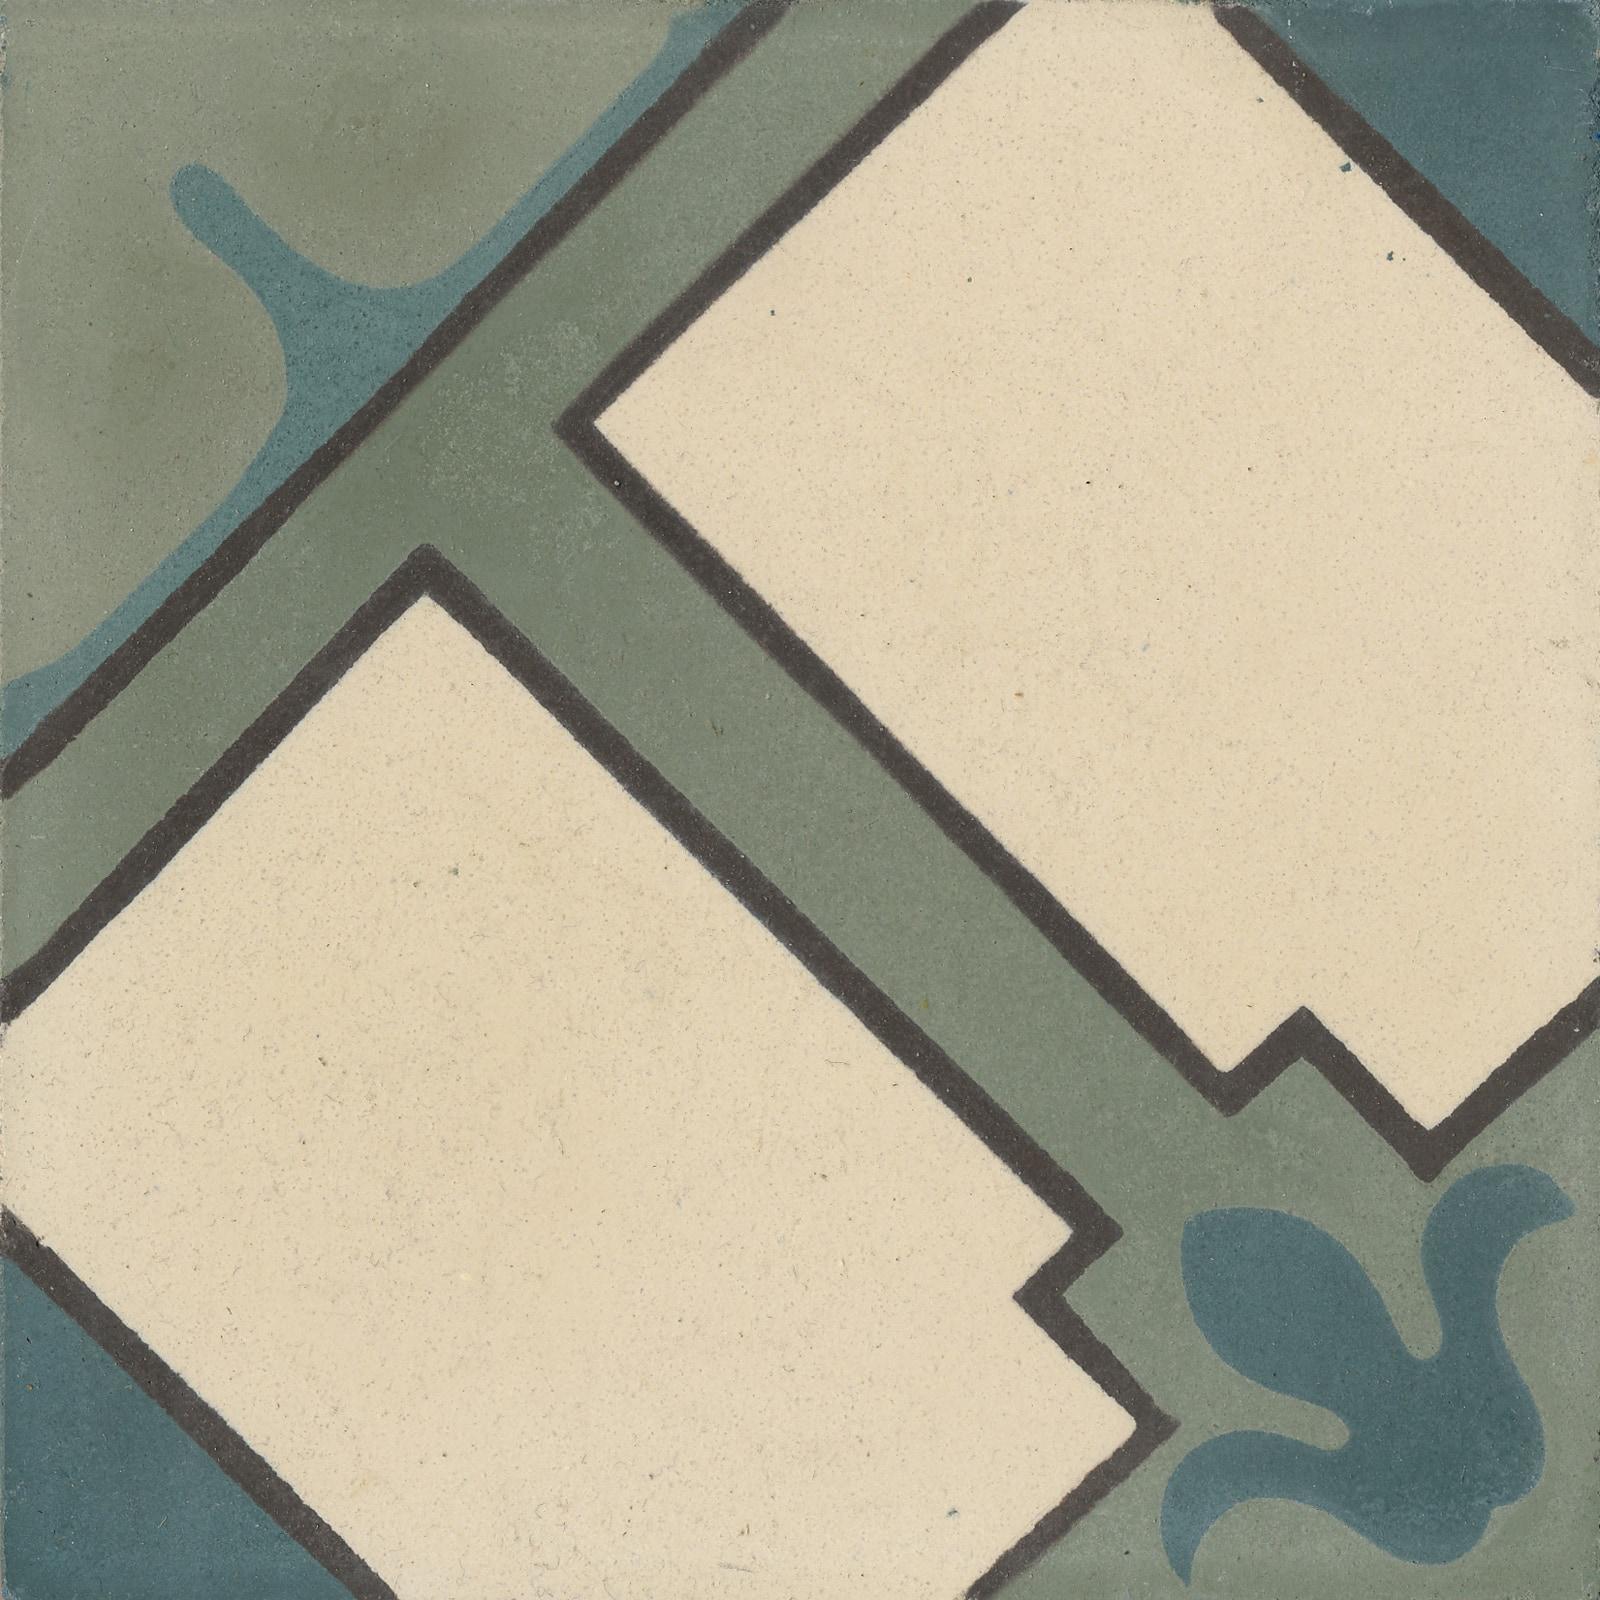 VIA-Zementmosaikplatten-nummer-51060-VIA-GmbH | 51060/141